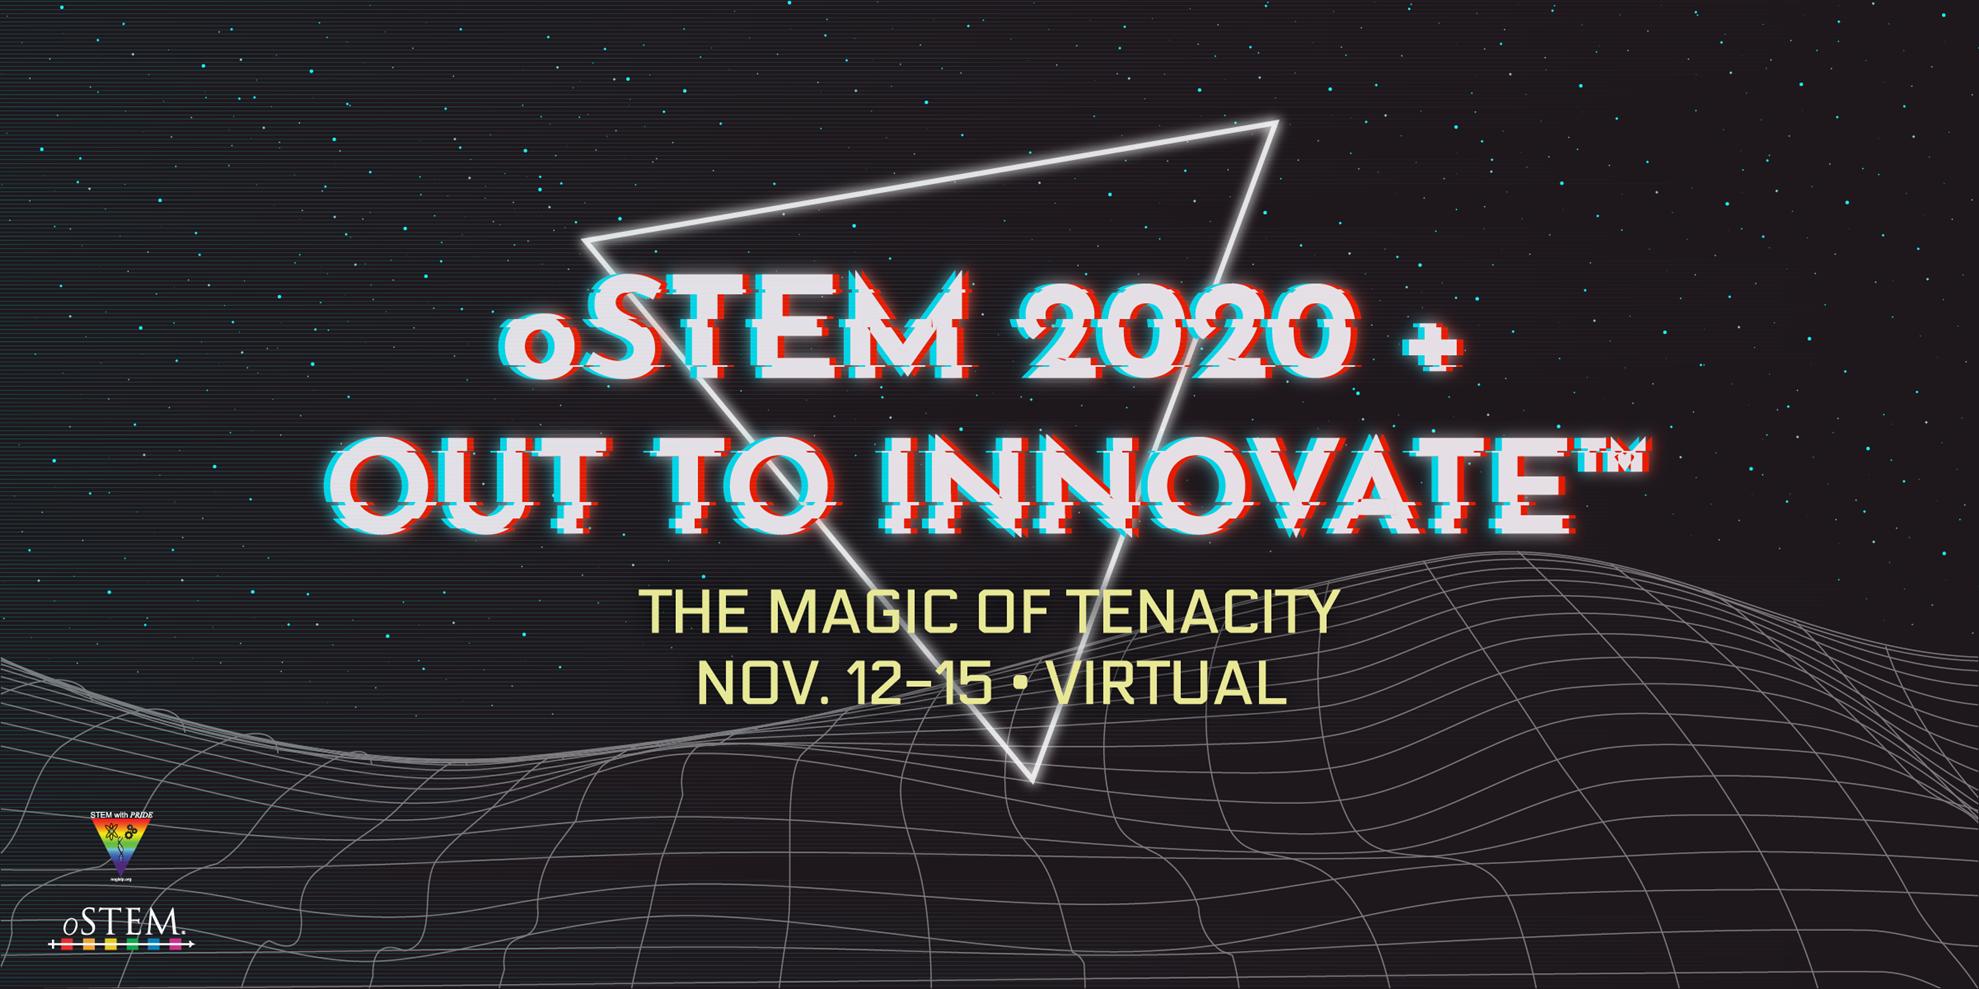 oSTEM 2020 Conference Image